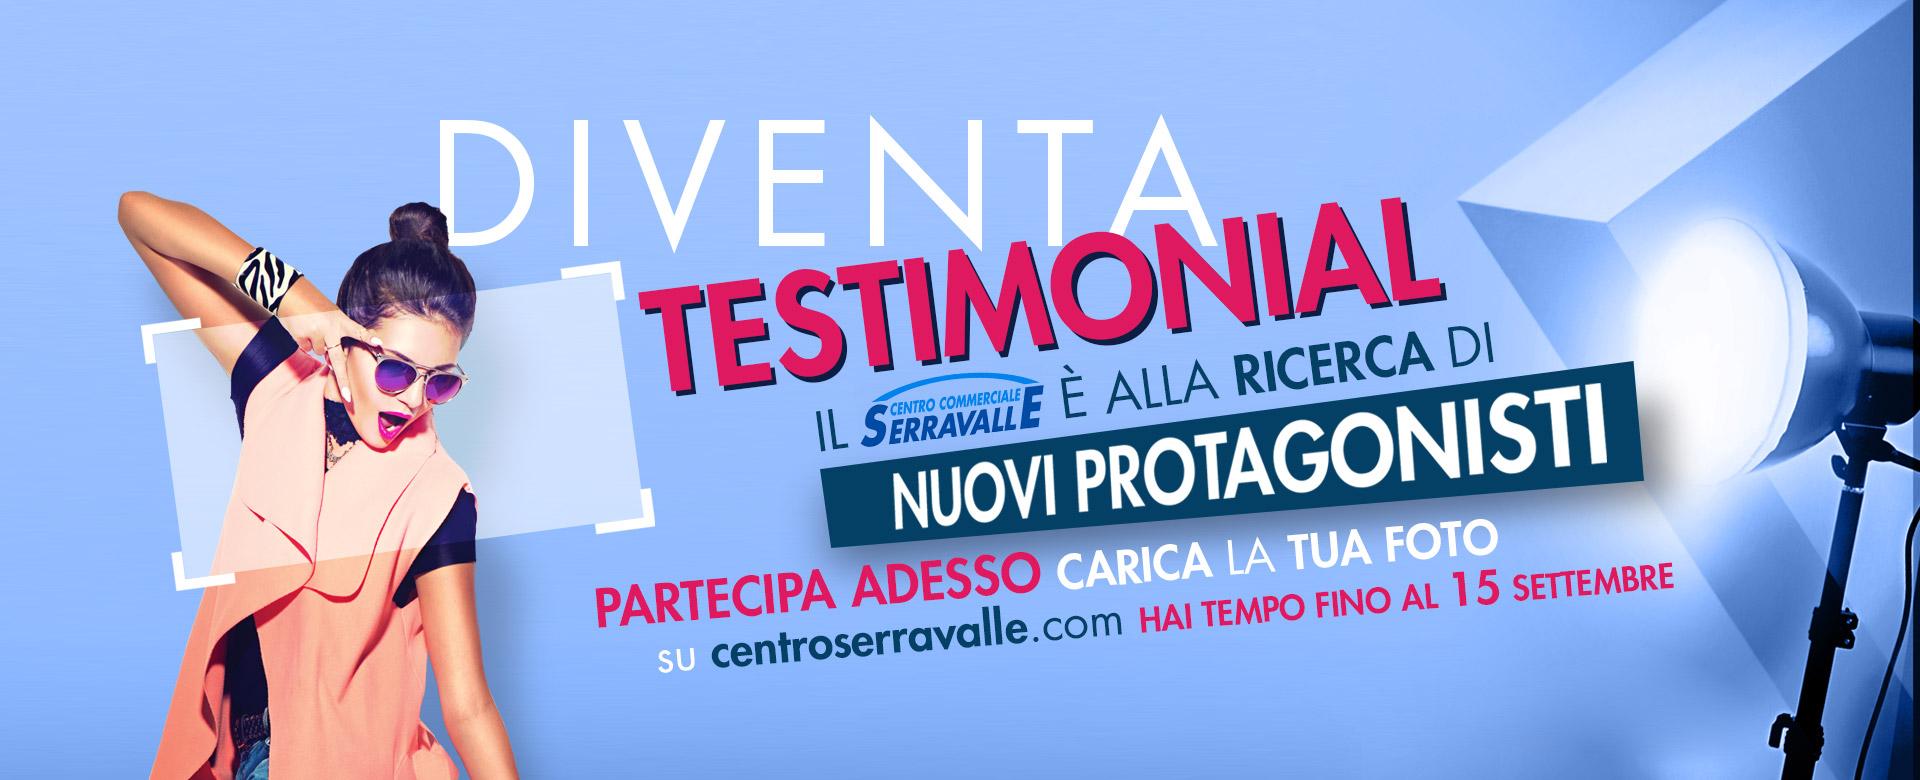 banner_diventa_testimonial